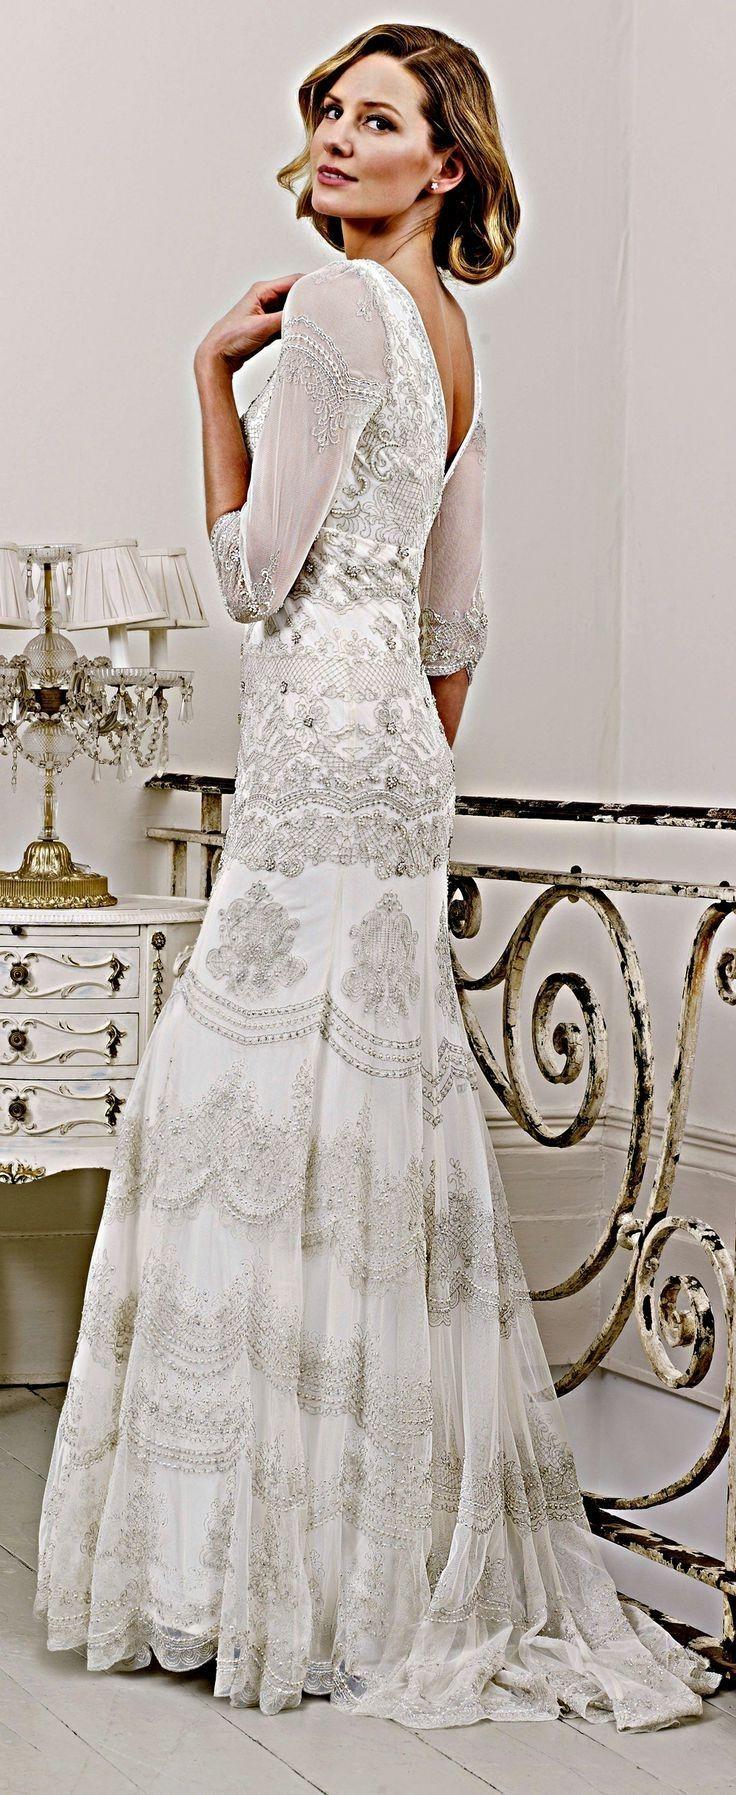 Best Second Wedding Dresses Ideas On Pinterest Vow Renewal Older Bride Wedding Dress Second Wedding Dresses Wedding Dress Over 40,Short Casual Plus Size Wedding Dress